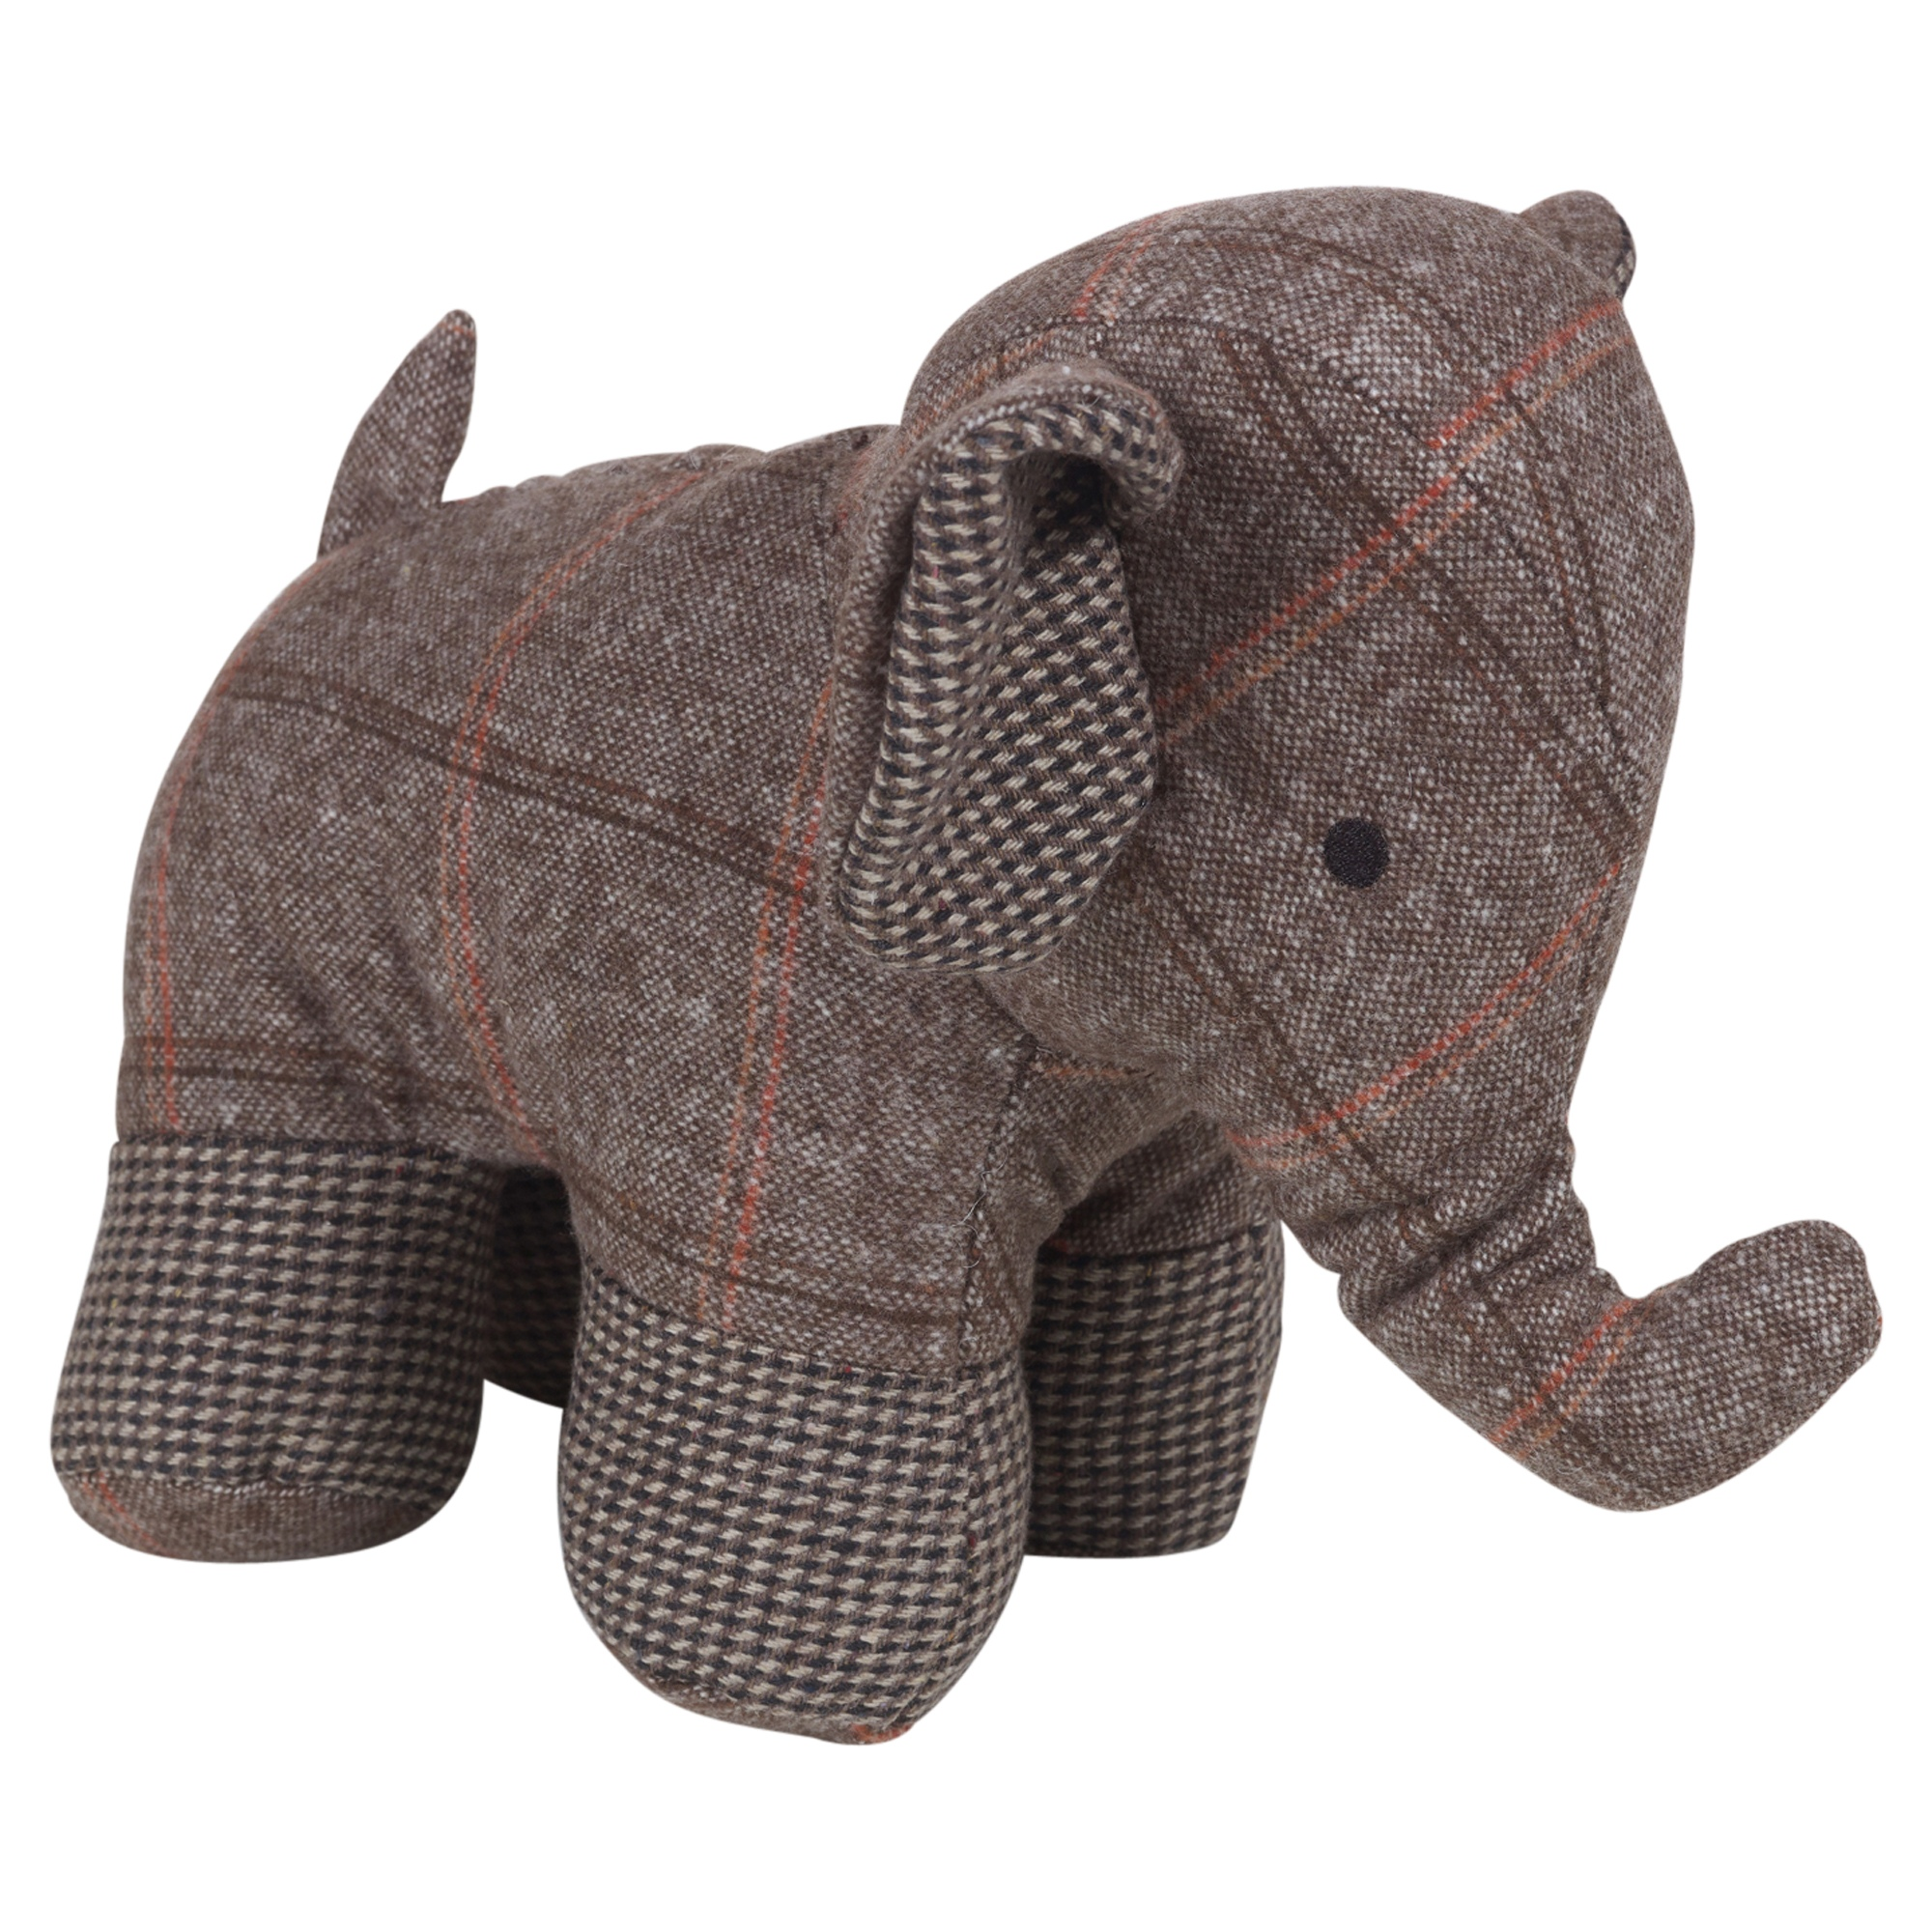 Elephant Door Stop Soft Stuff Plush Animal Novelty Cool Vintage Design 3 Colours Ebay